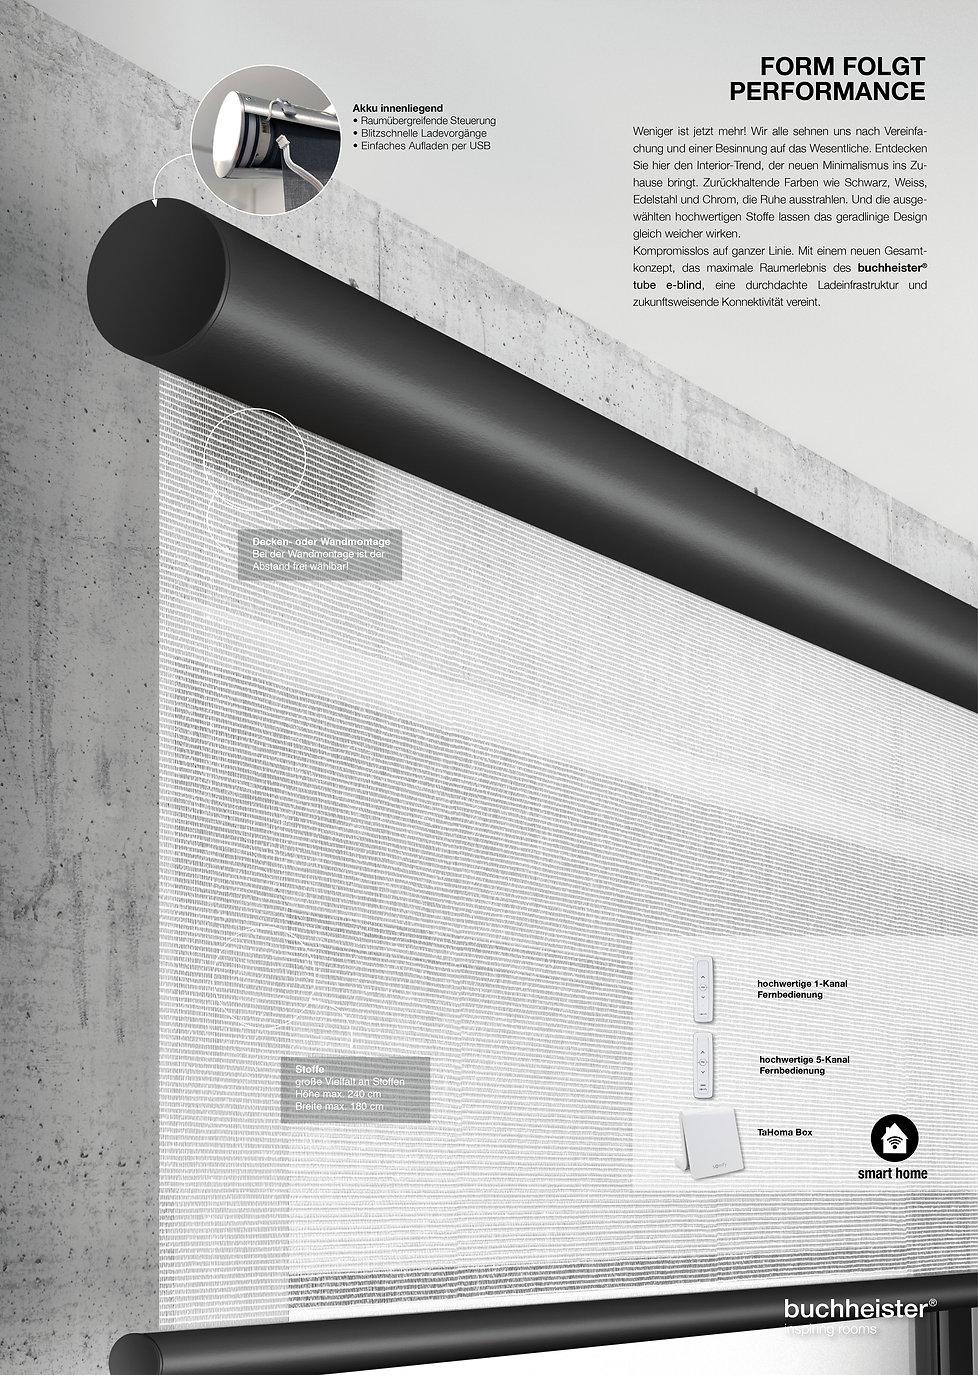 buchheister tube e-blind Wandmontage mit Motor